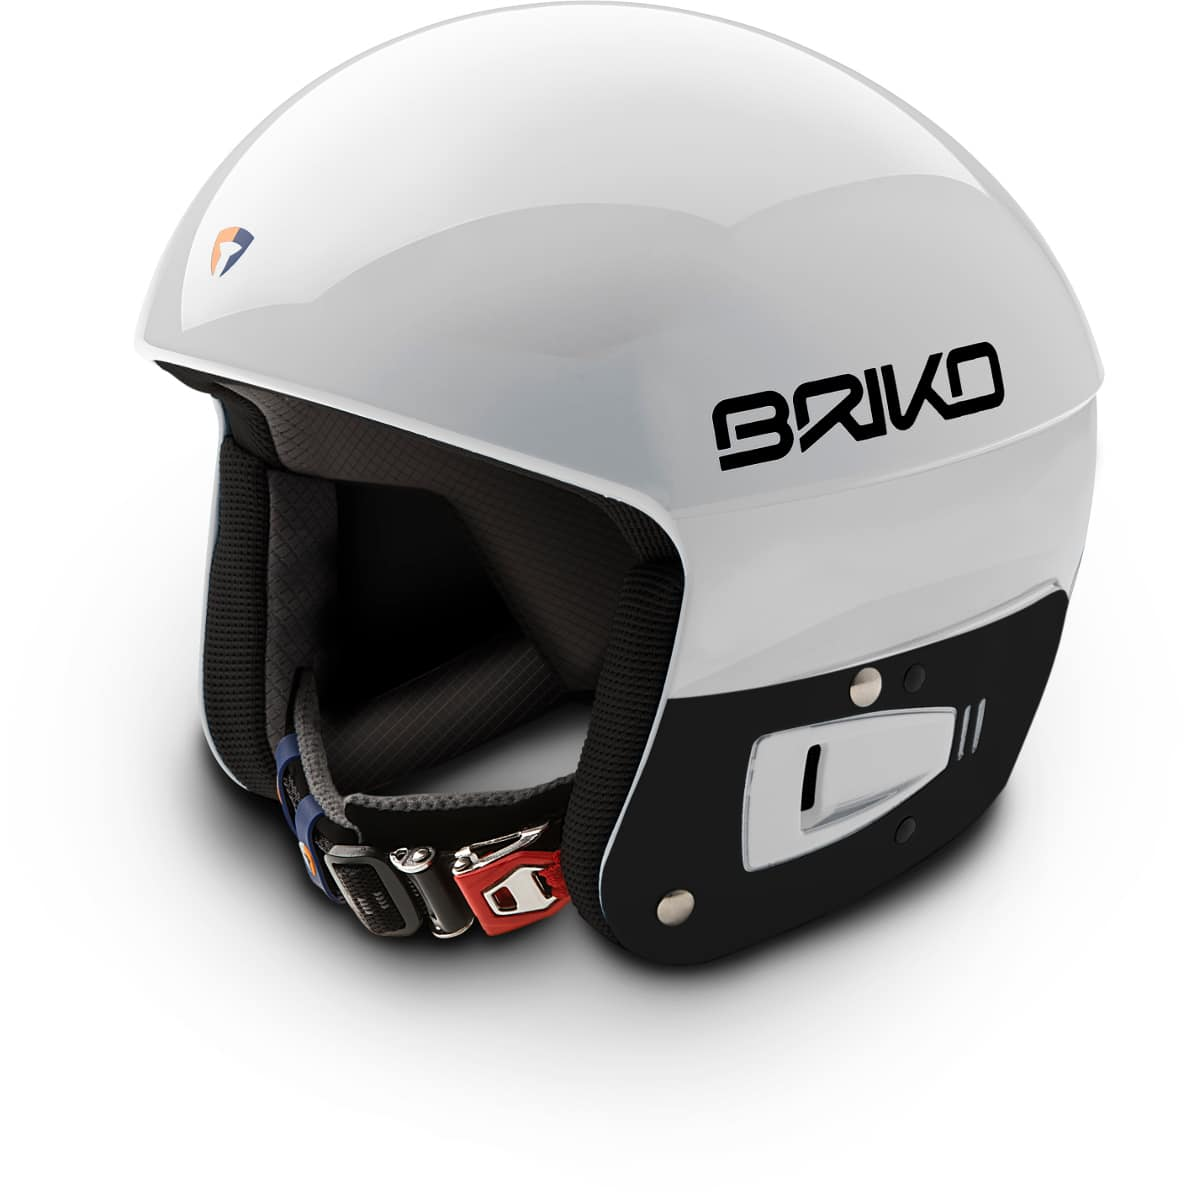 Briko Vulcano FIS JR Helmet - White Ash